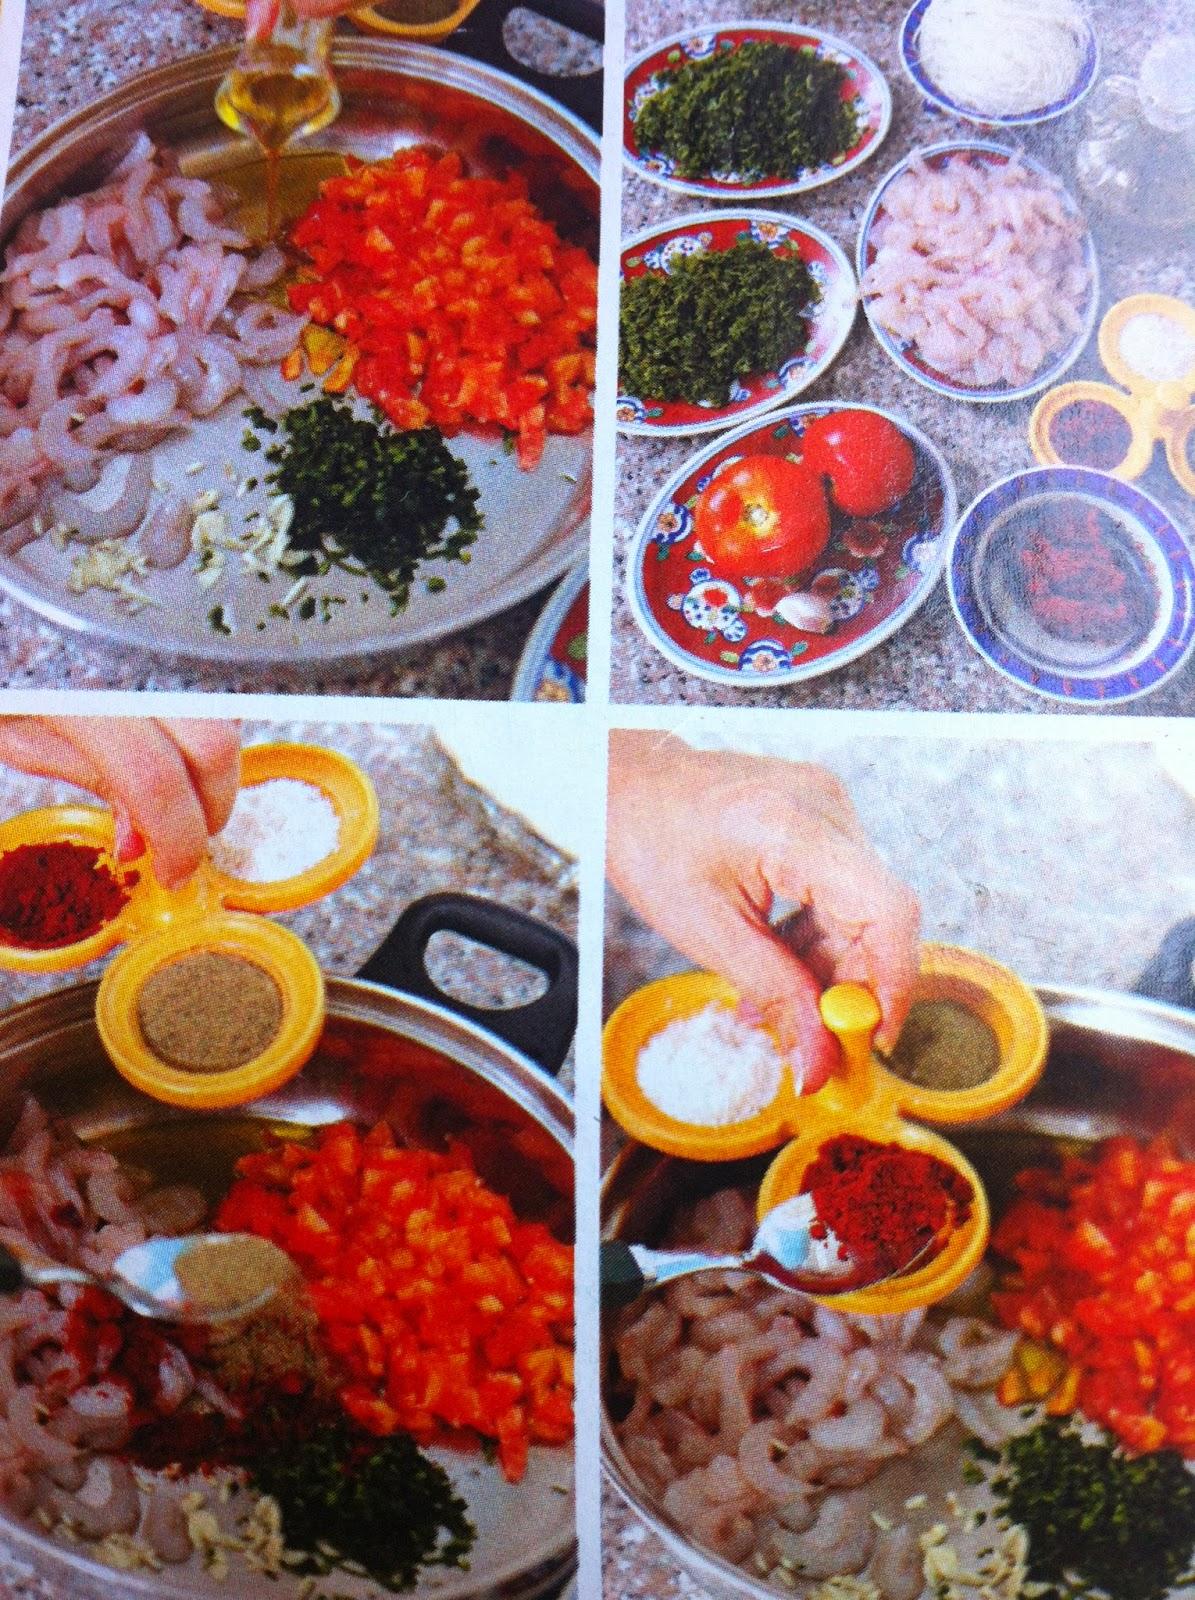 http://www.cuisinepress.com/2015/04/blog-post_25.html